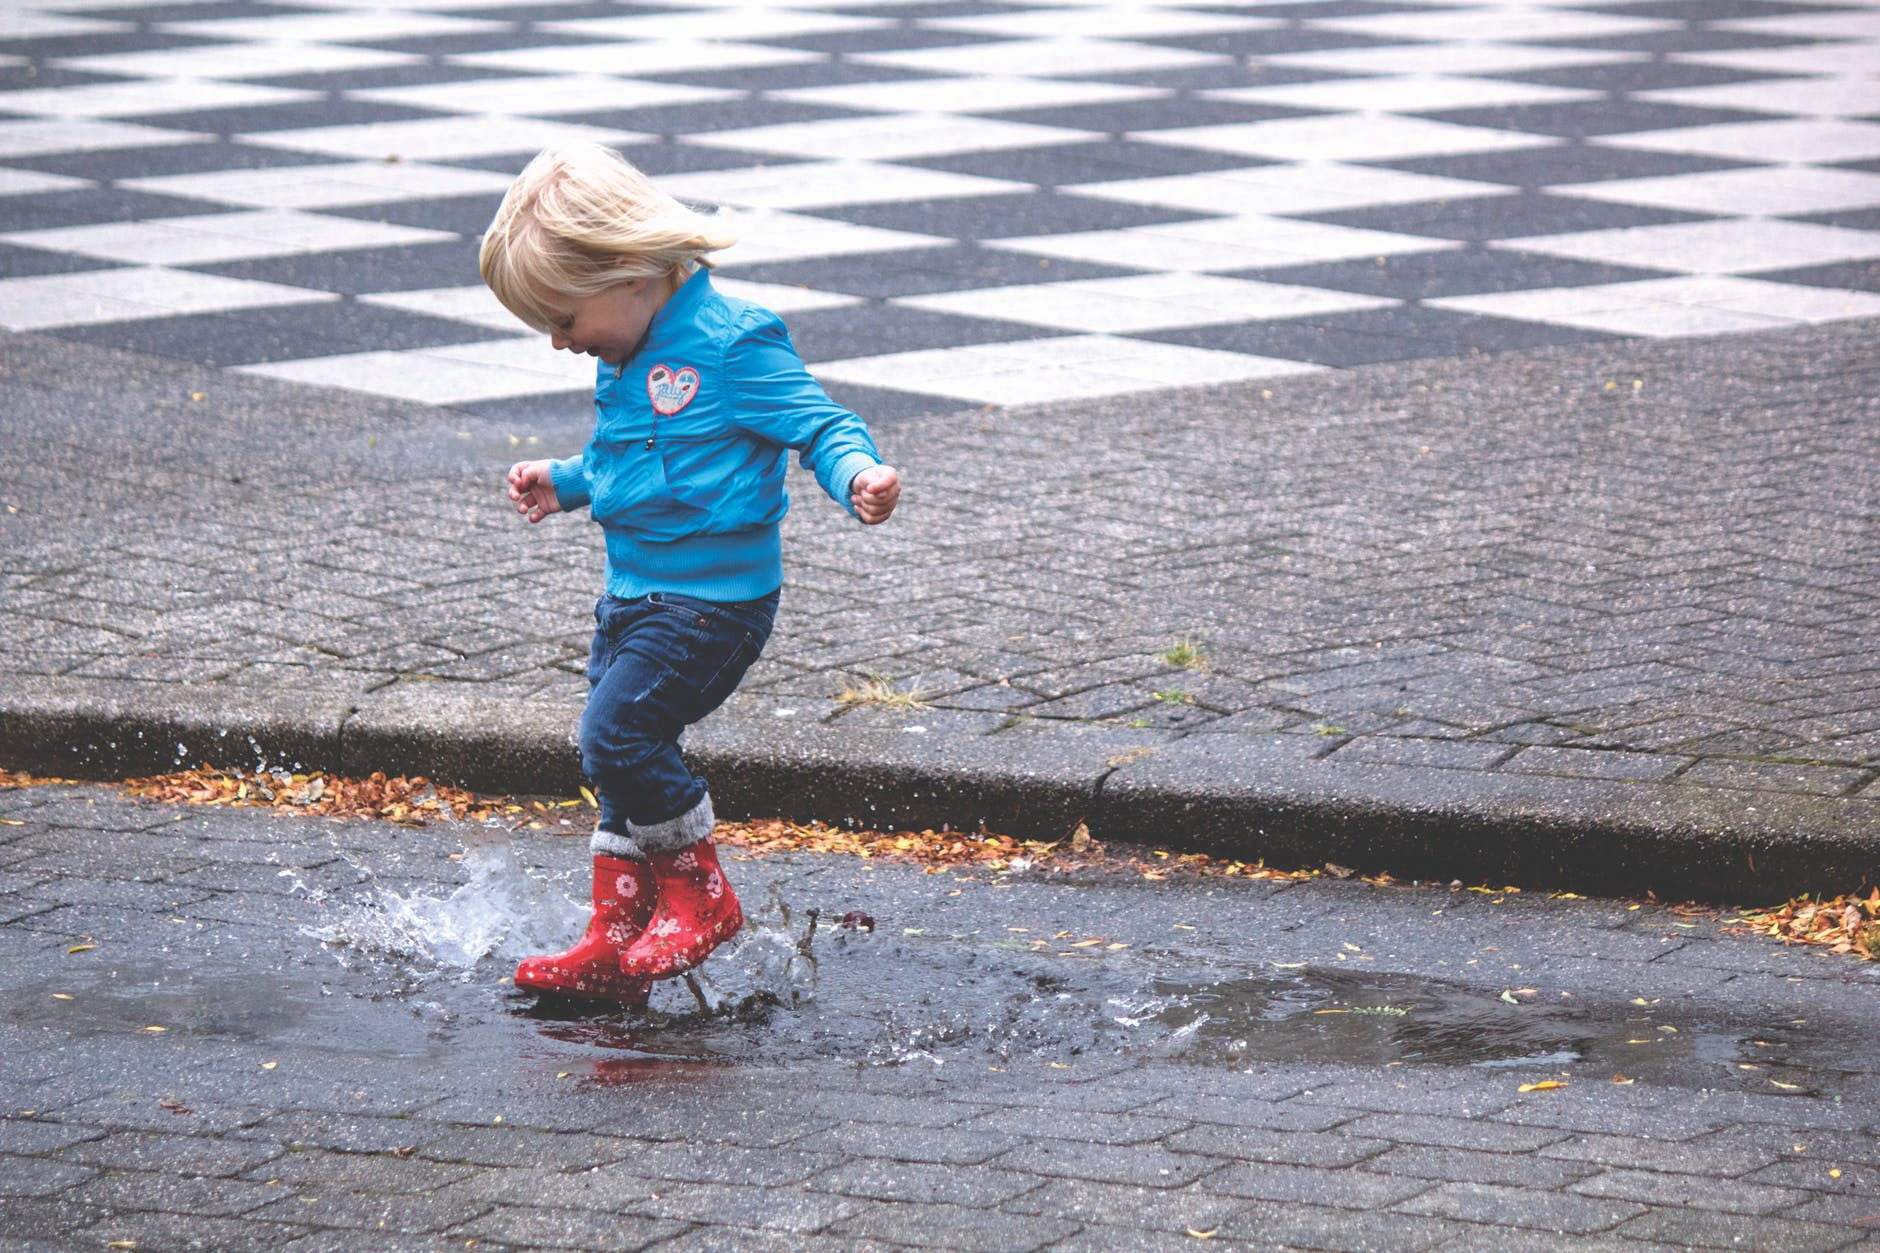 Na cebulkę - strój dla malucha na wiosenny spacer